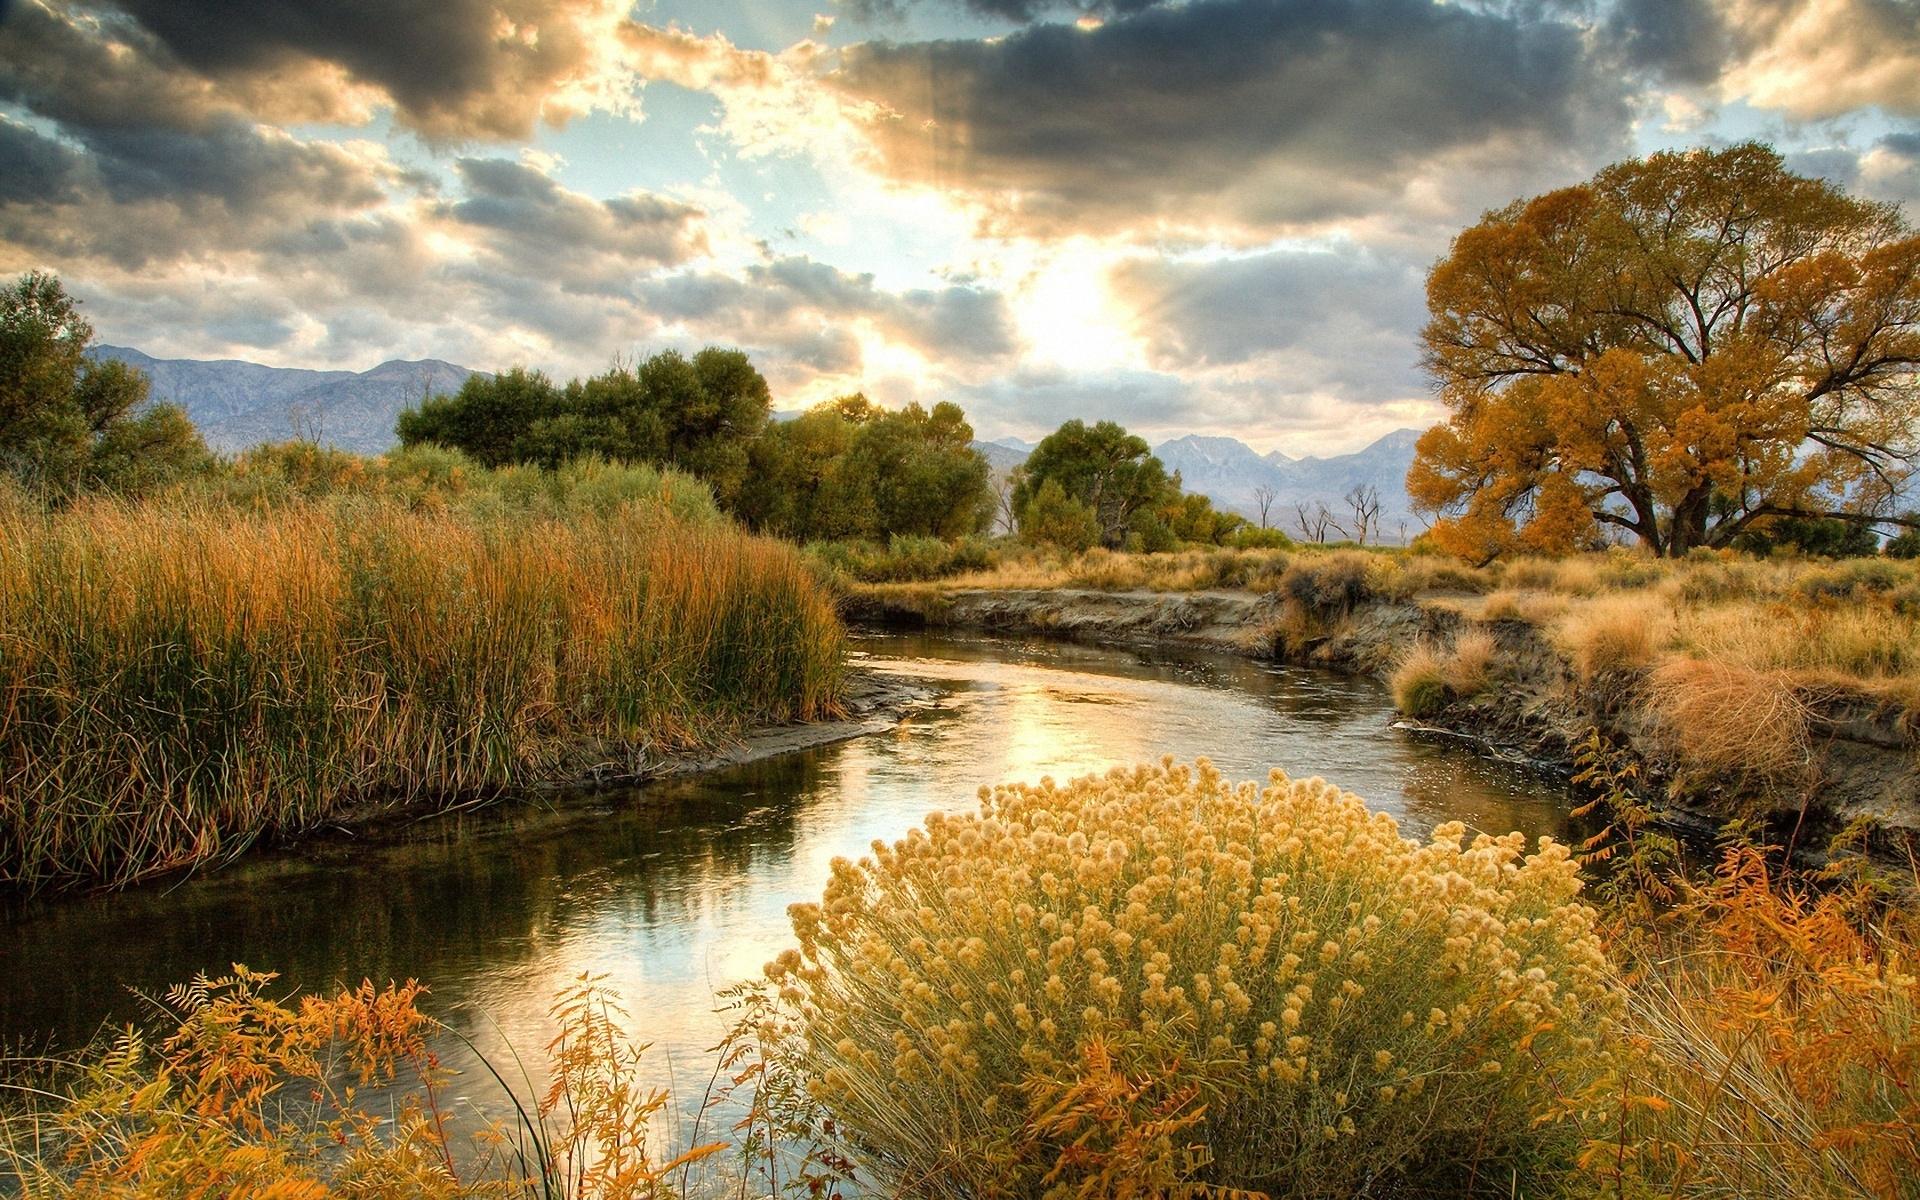 Картинки Кусты, река, солнце, облака фото и обои на рабочий стол